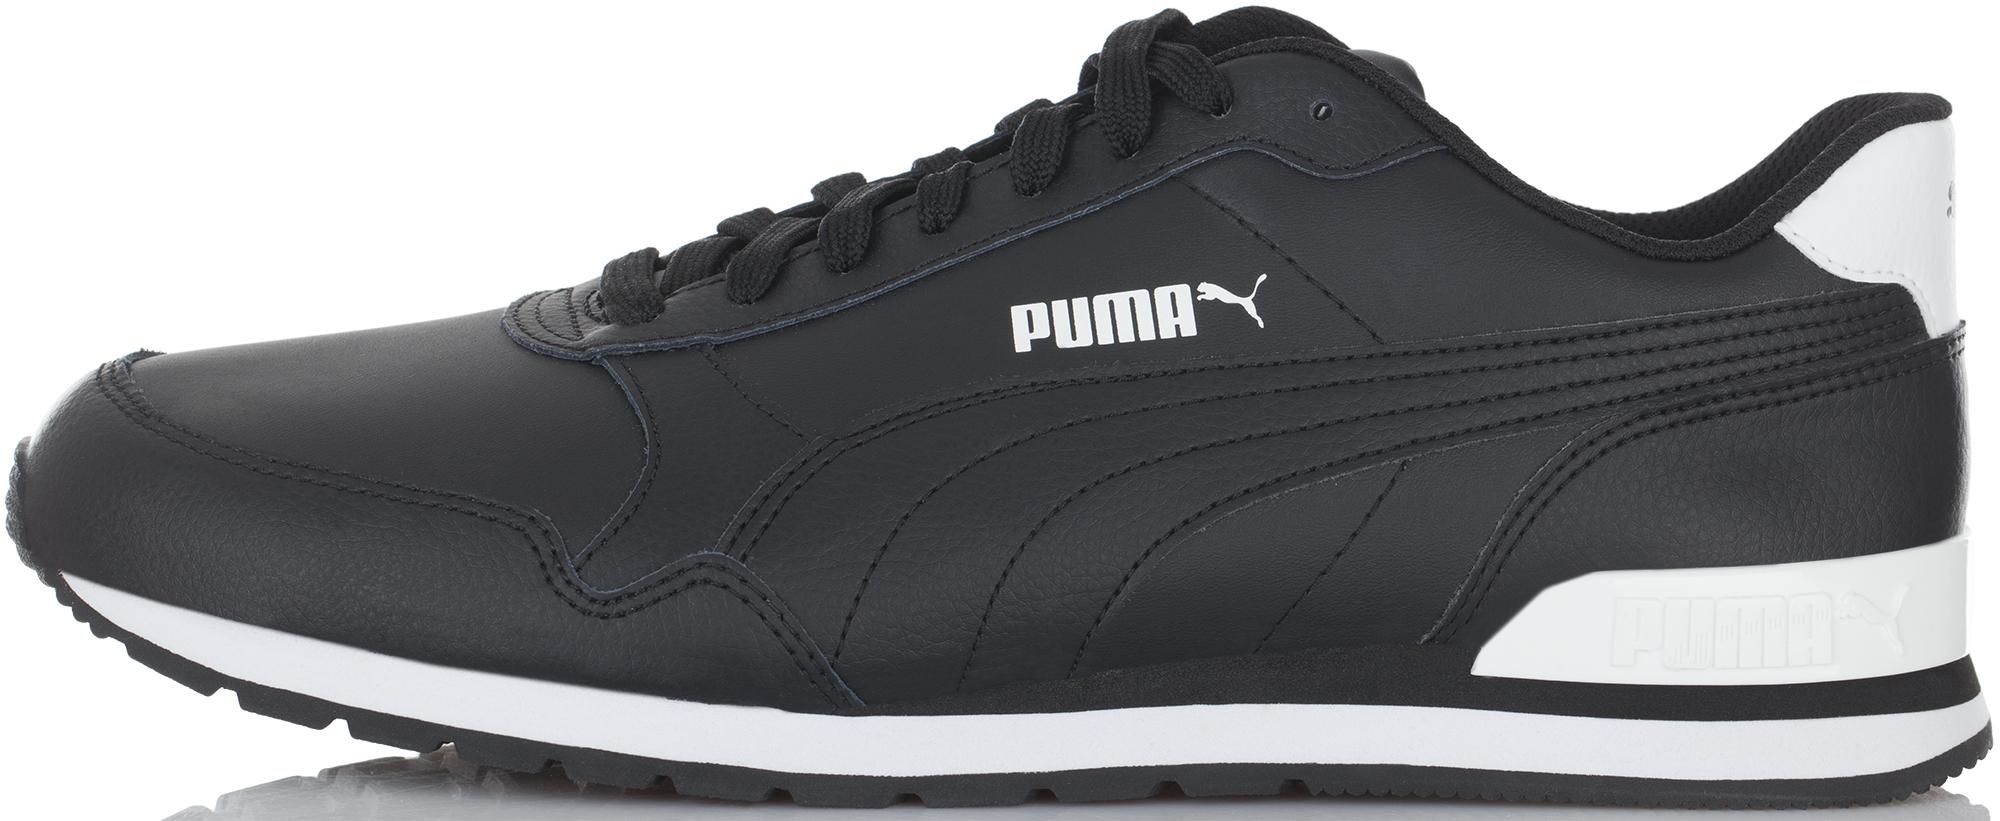 Puma Кроссовки мужские Puma ST Runner кроссовки nike кроссовки md runner 2